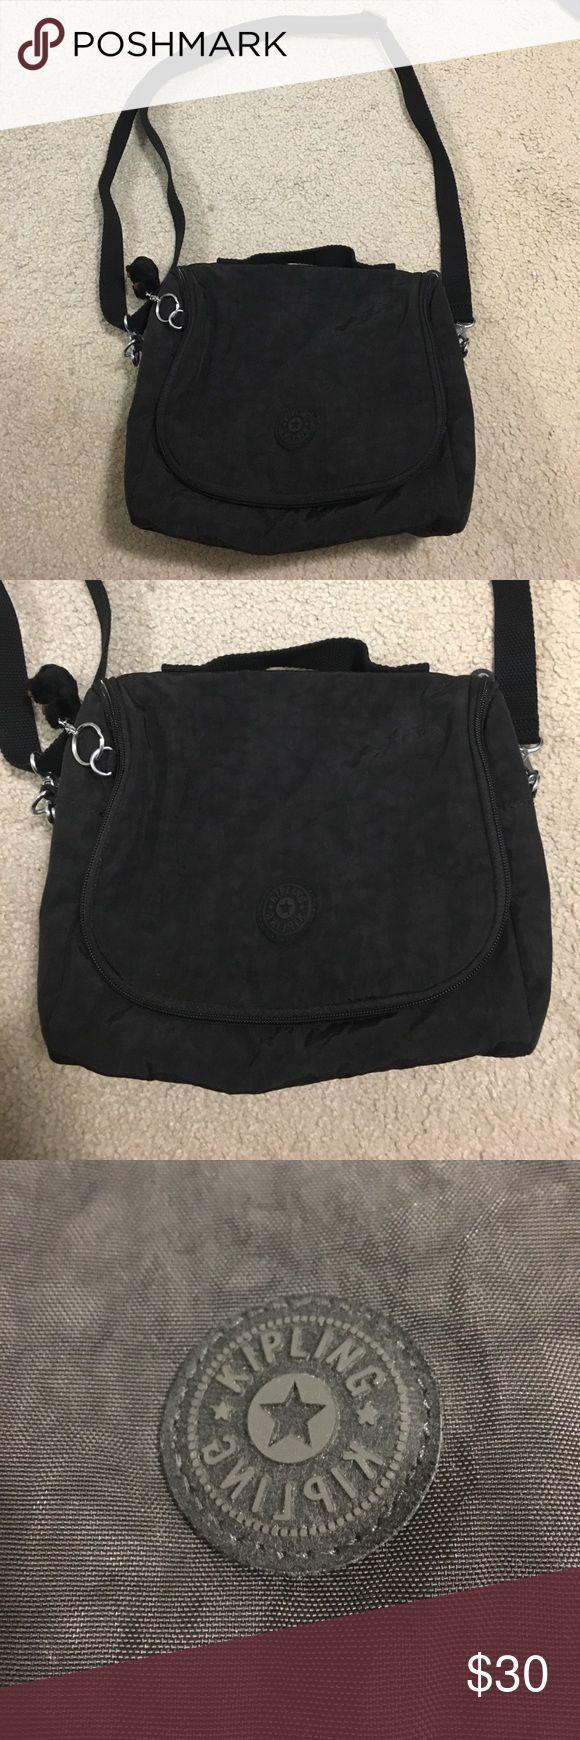 NWOT Kipling Black Shoulder Lunch Bag super cute black lunch bag from kipling. it's unsuliated. only used a couple of times. has an adjustable black shoulder strap and a handle strap on top. Kipling Bags Shoulder Bags